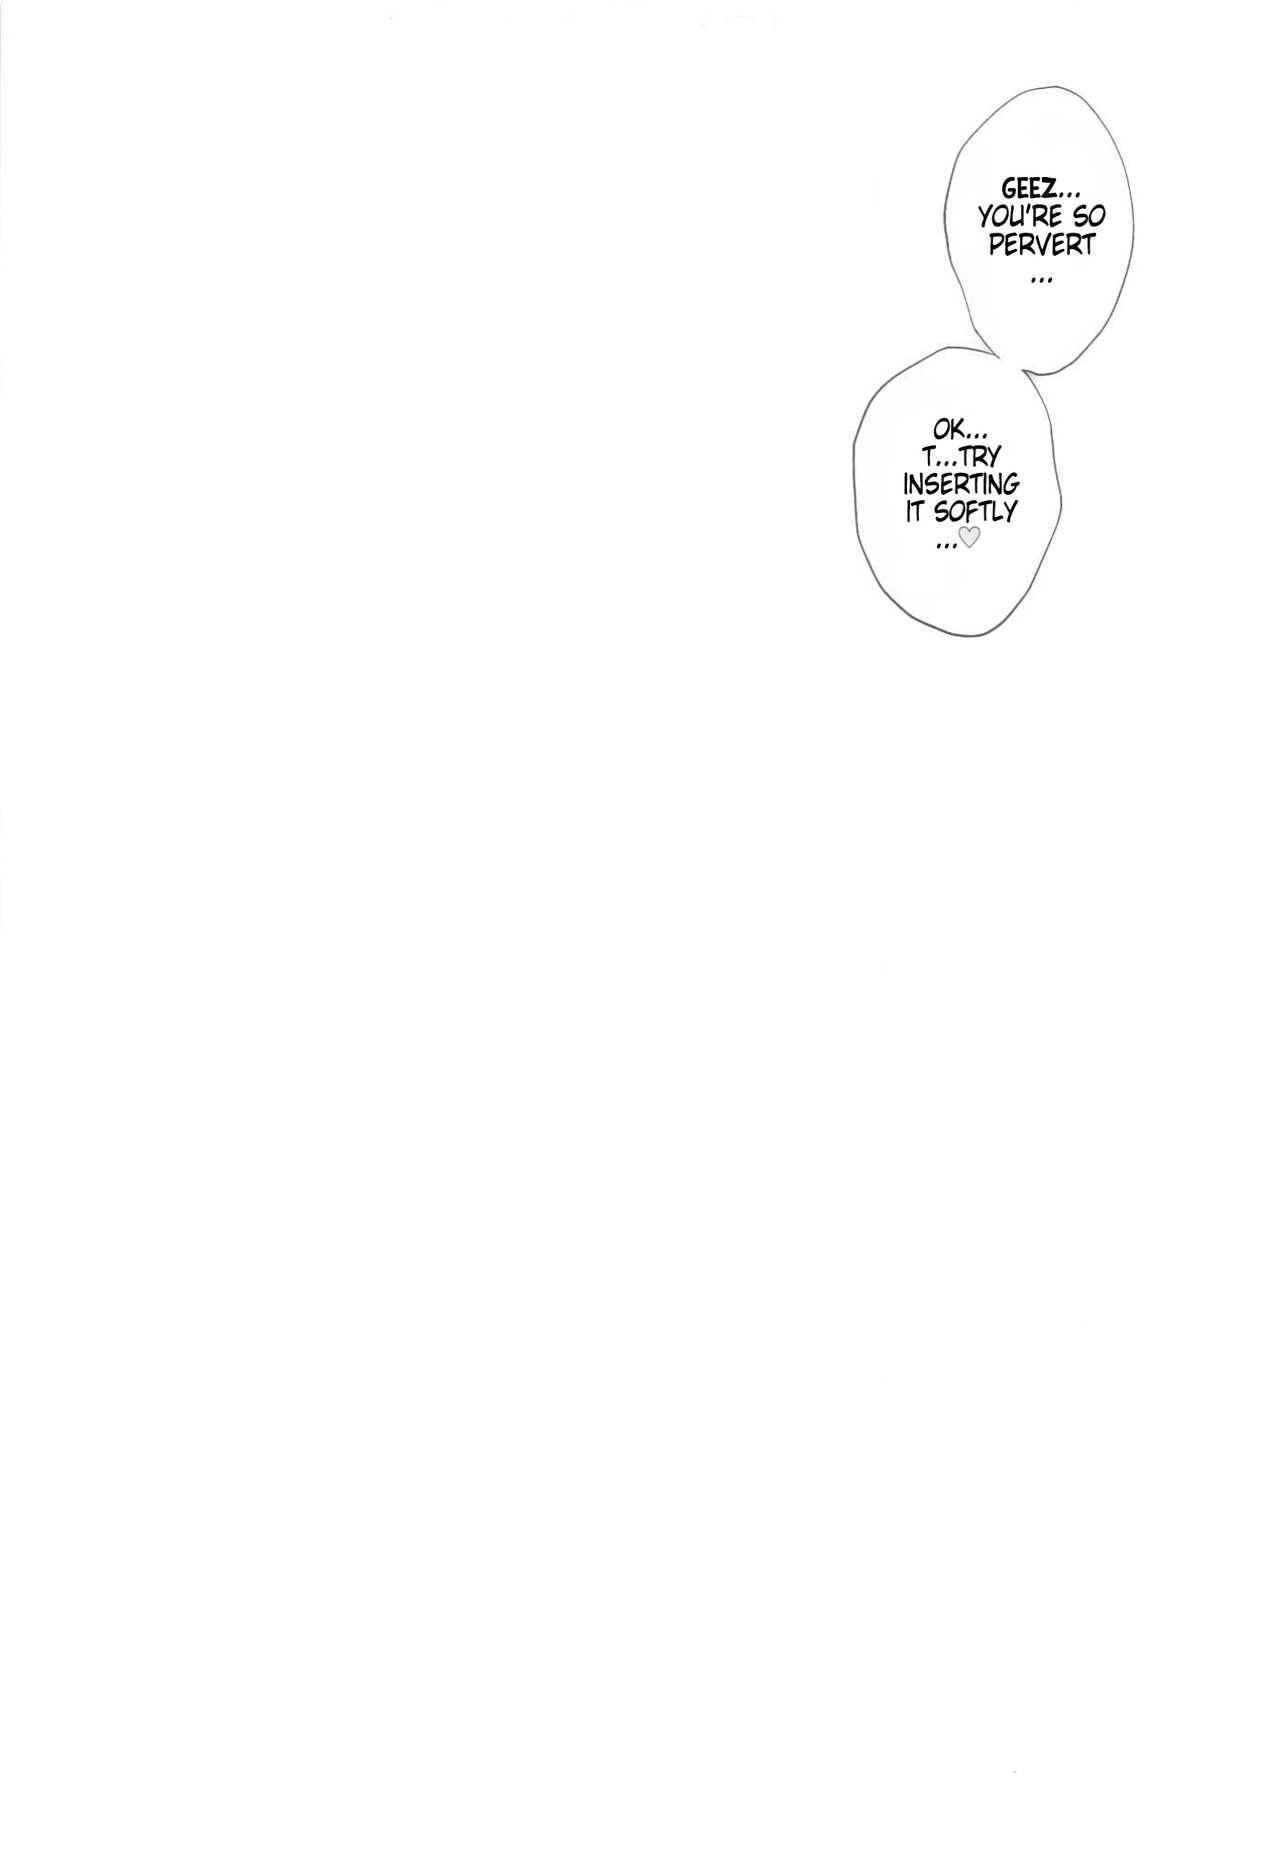 [Mata Ashita. (Oohira Sunset)] Boudica-san to Gom. -Anal Hen- | Boudica-san and Gom. -Anal Edition- (Fate/Grand Order) [English] [Hellsin] [2019-09-22] 23